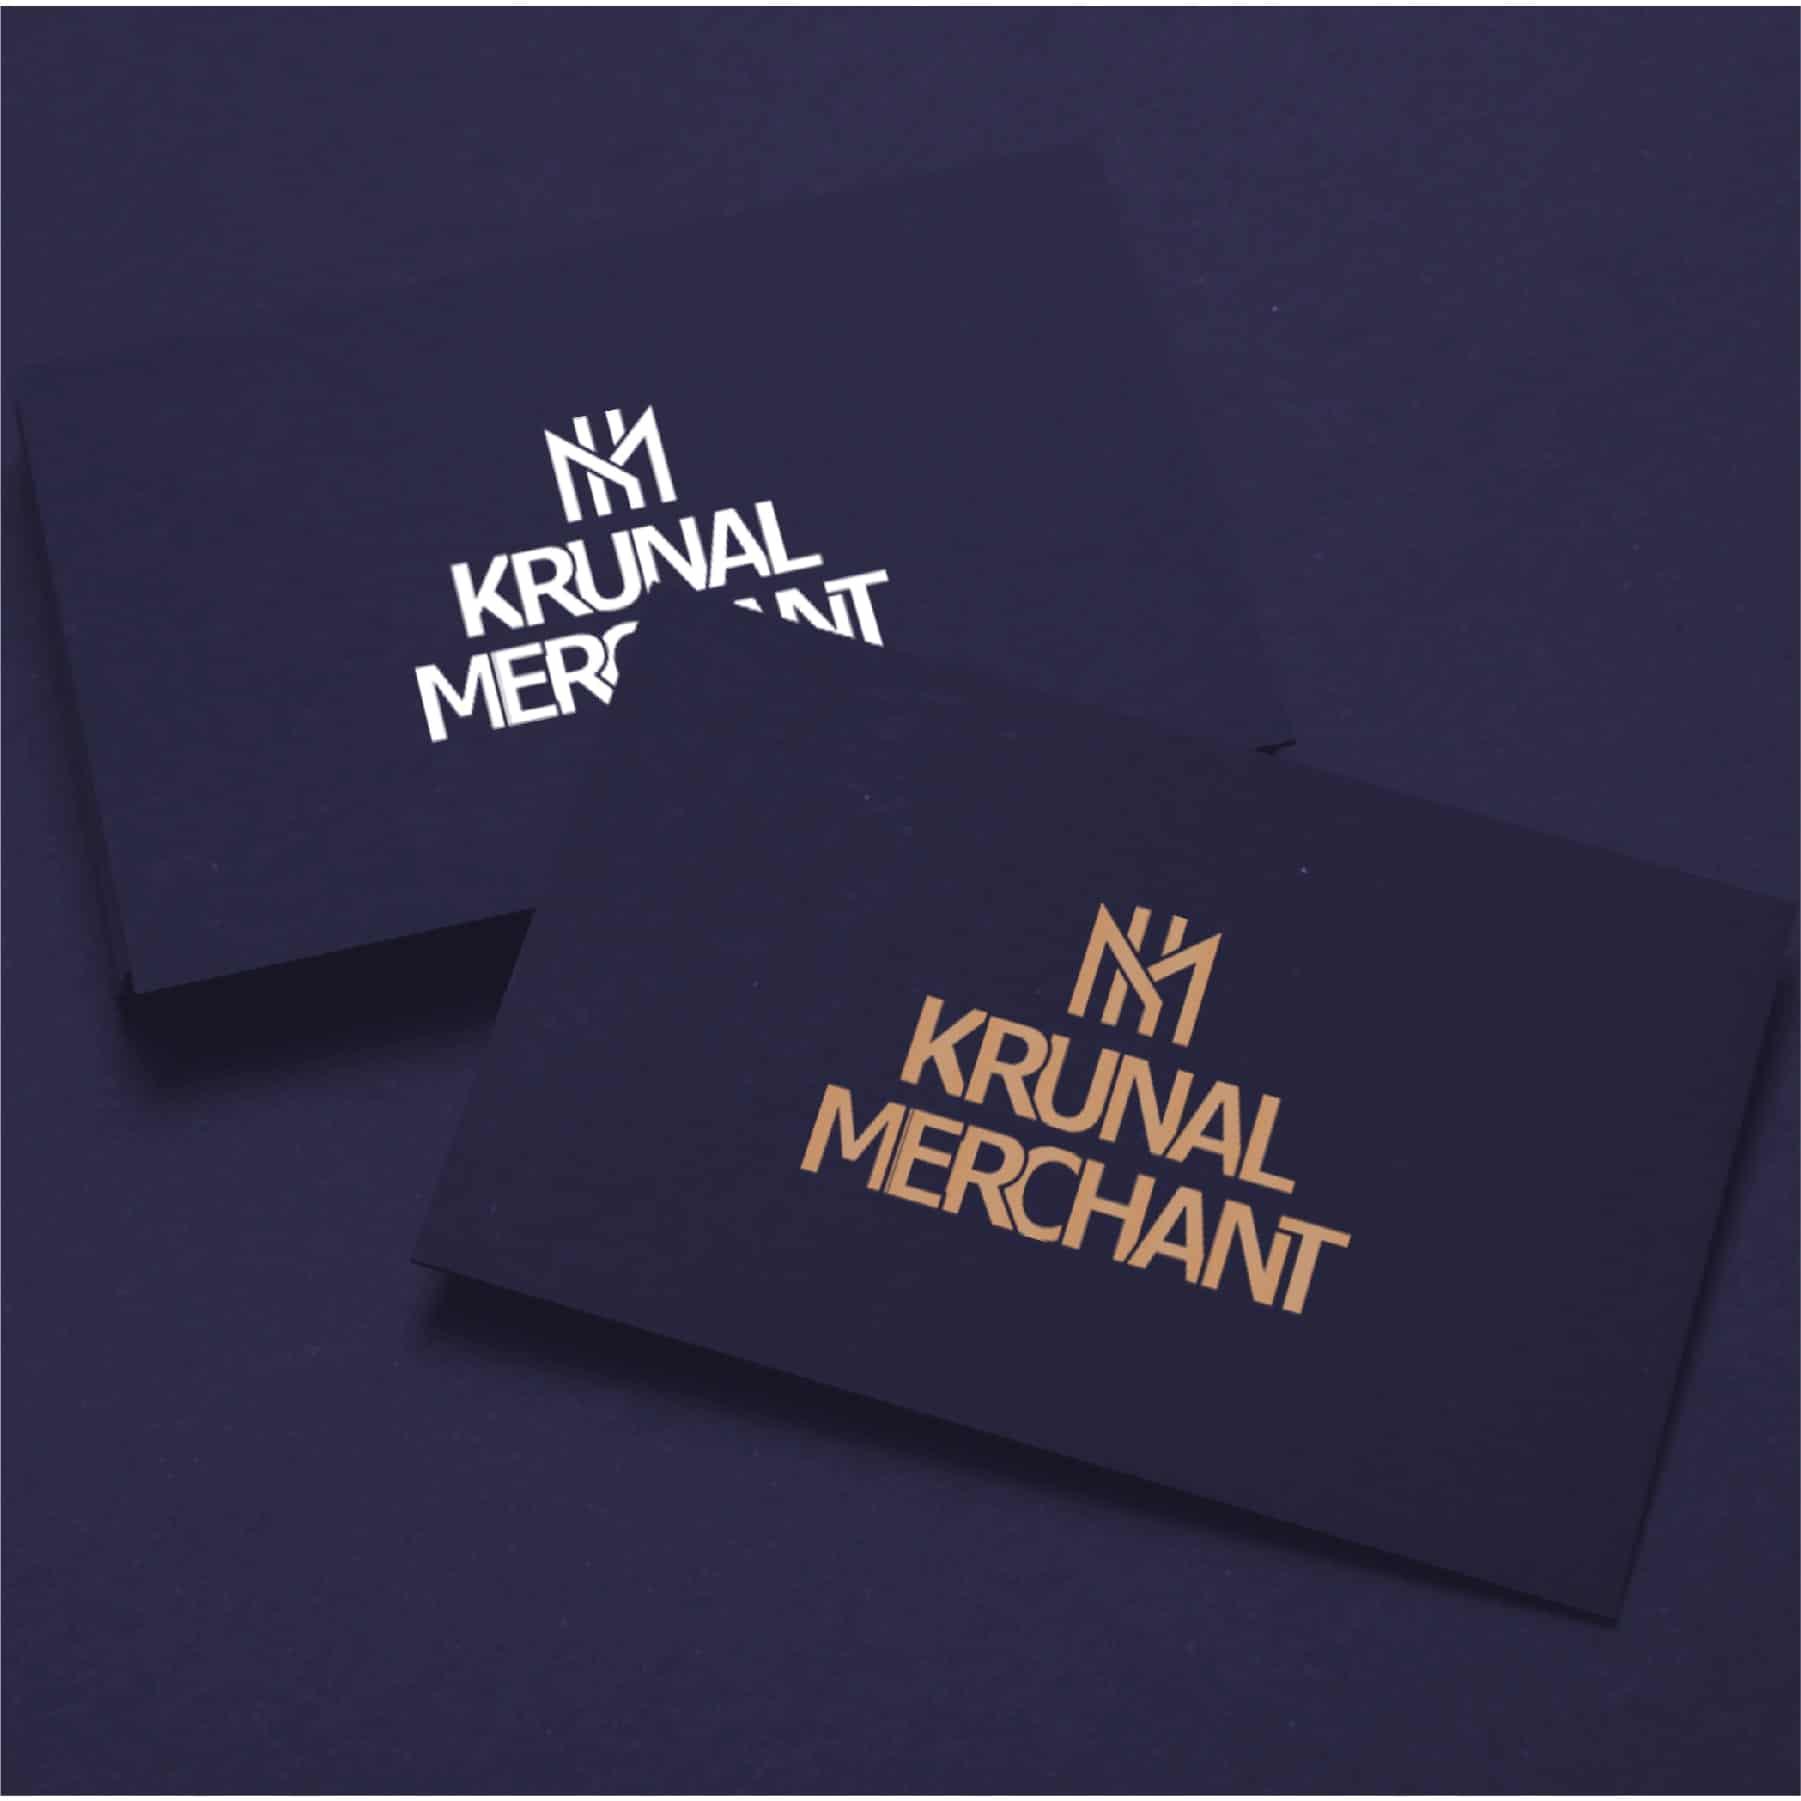 KRUNAL MERCHANT_Final logo_instagram-17-min